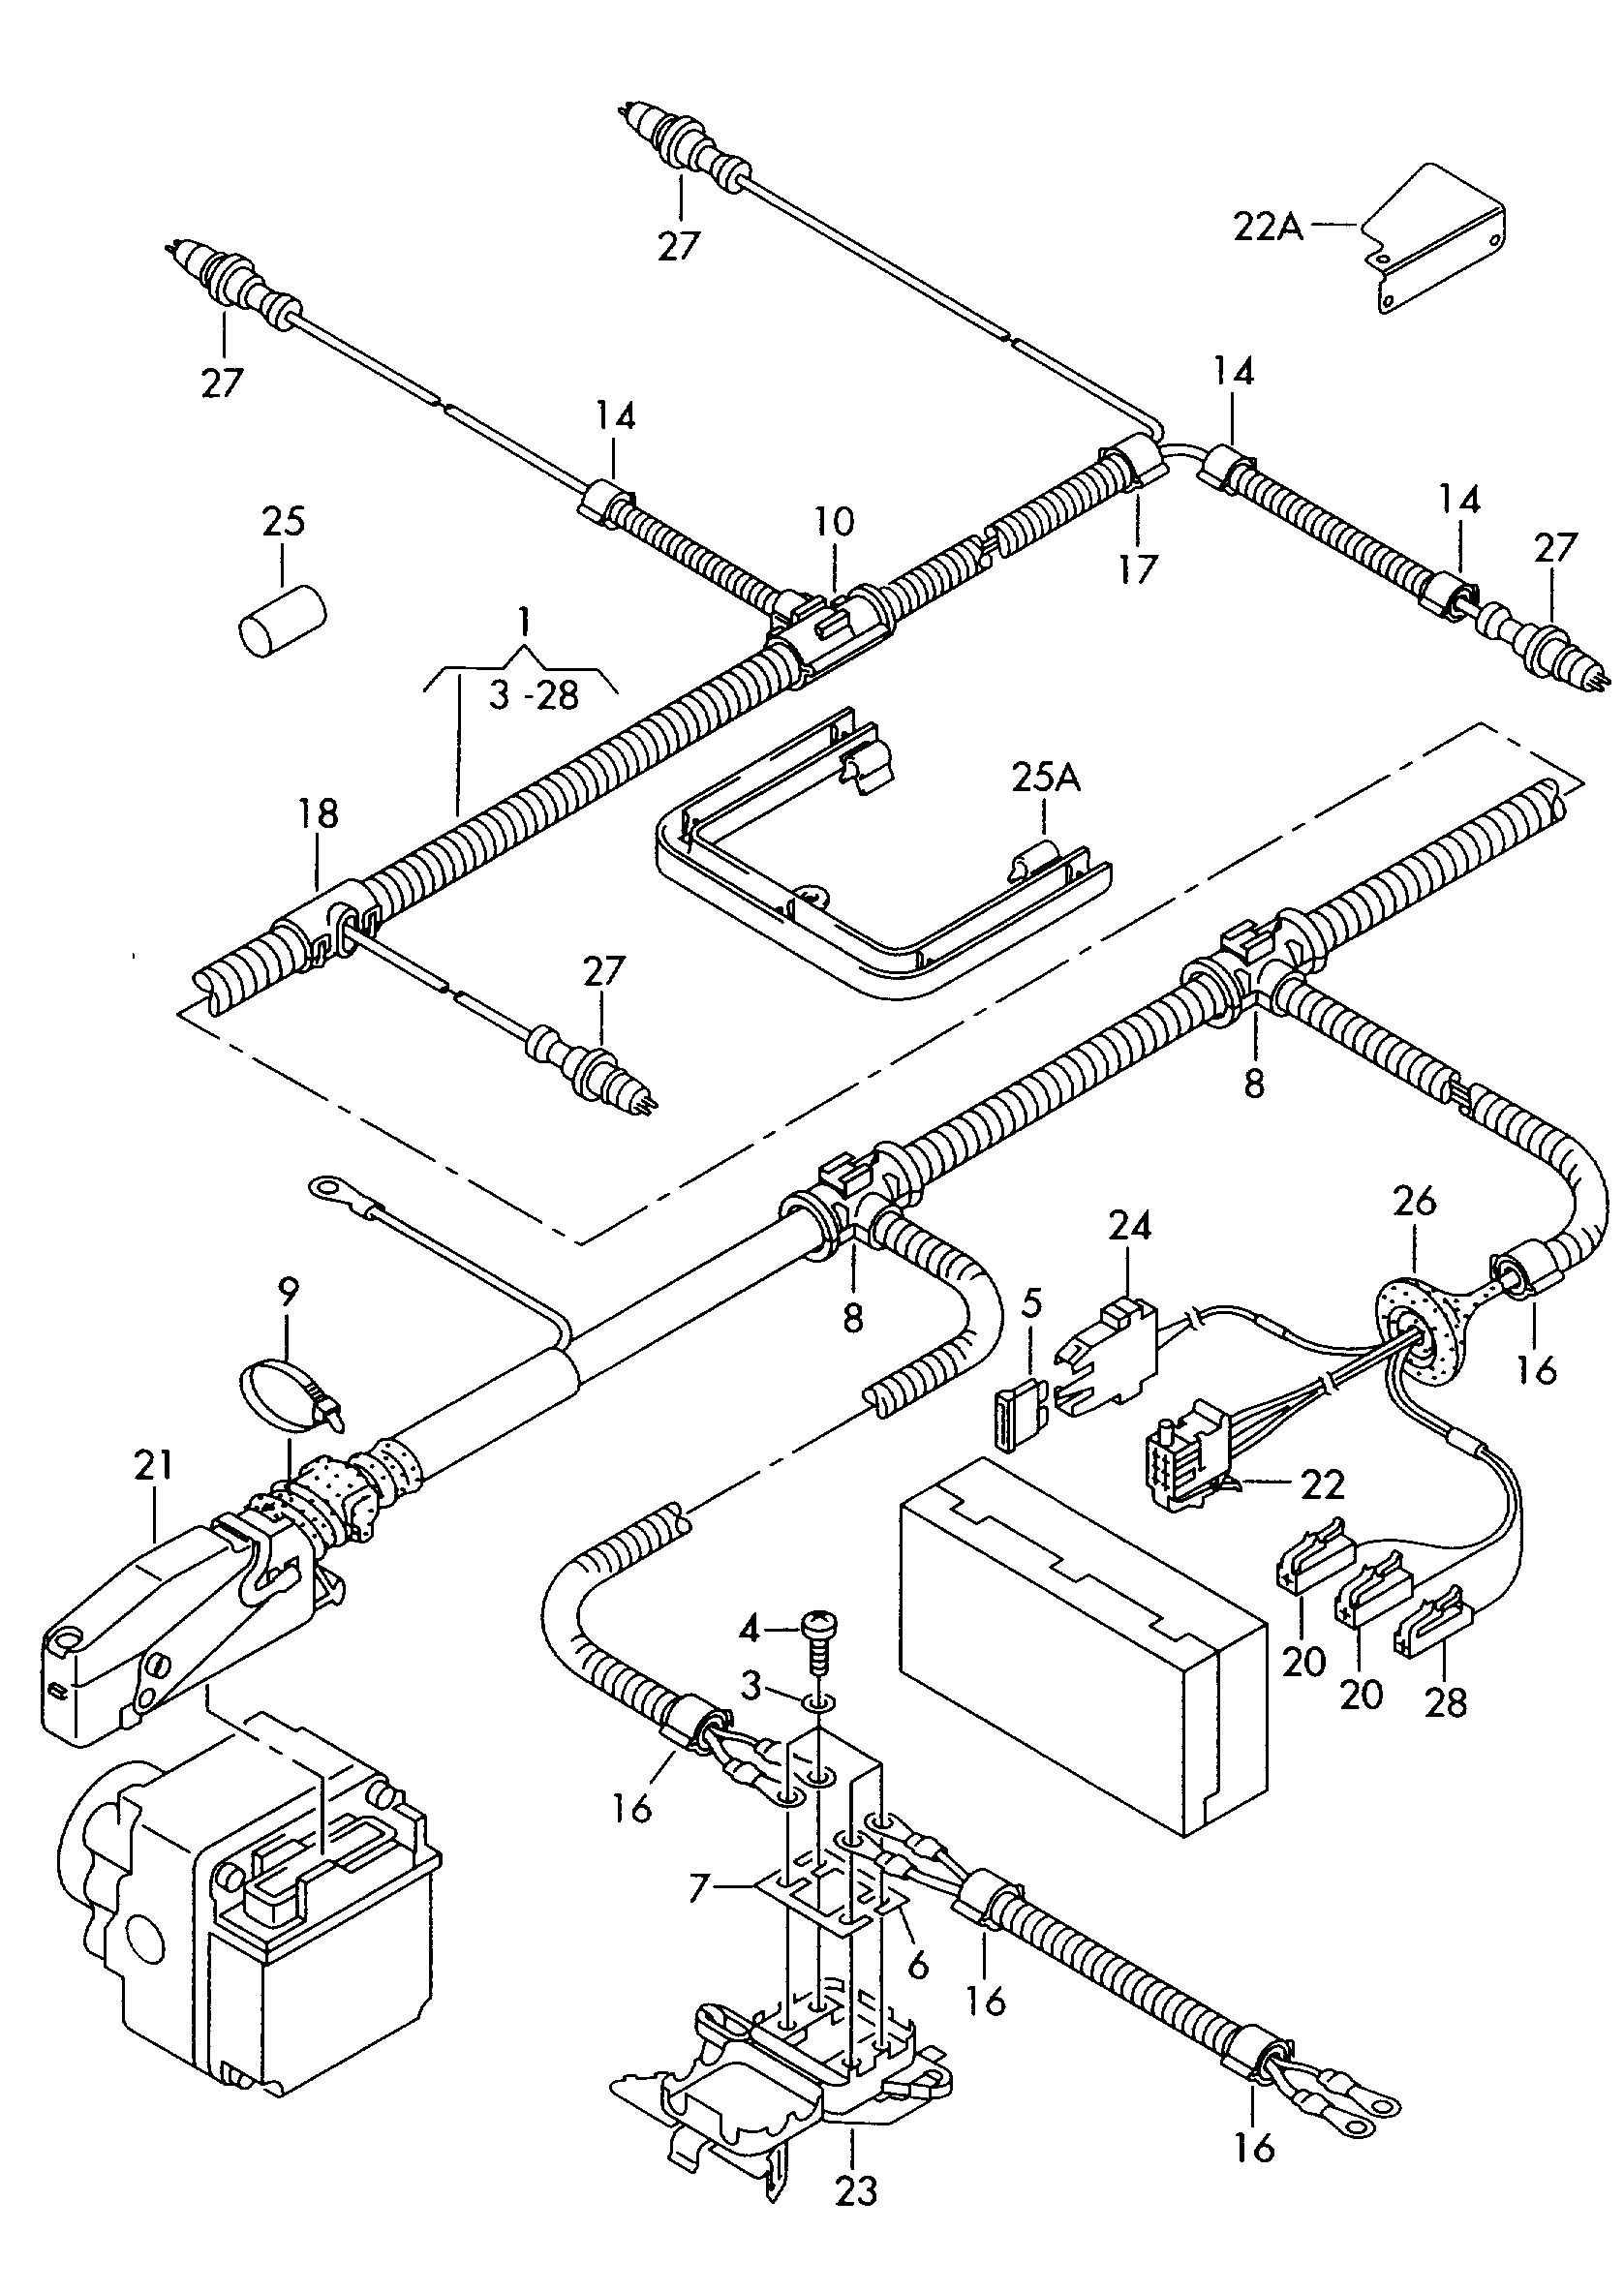 Diagram 1997 Vw Eurovan Fuse Box Diagram Full Version Hd Quality Box Diagram Diagramsaray Candyarena It